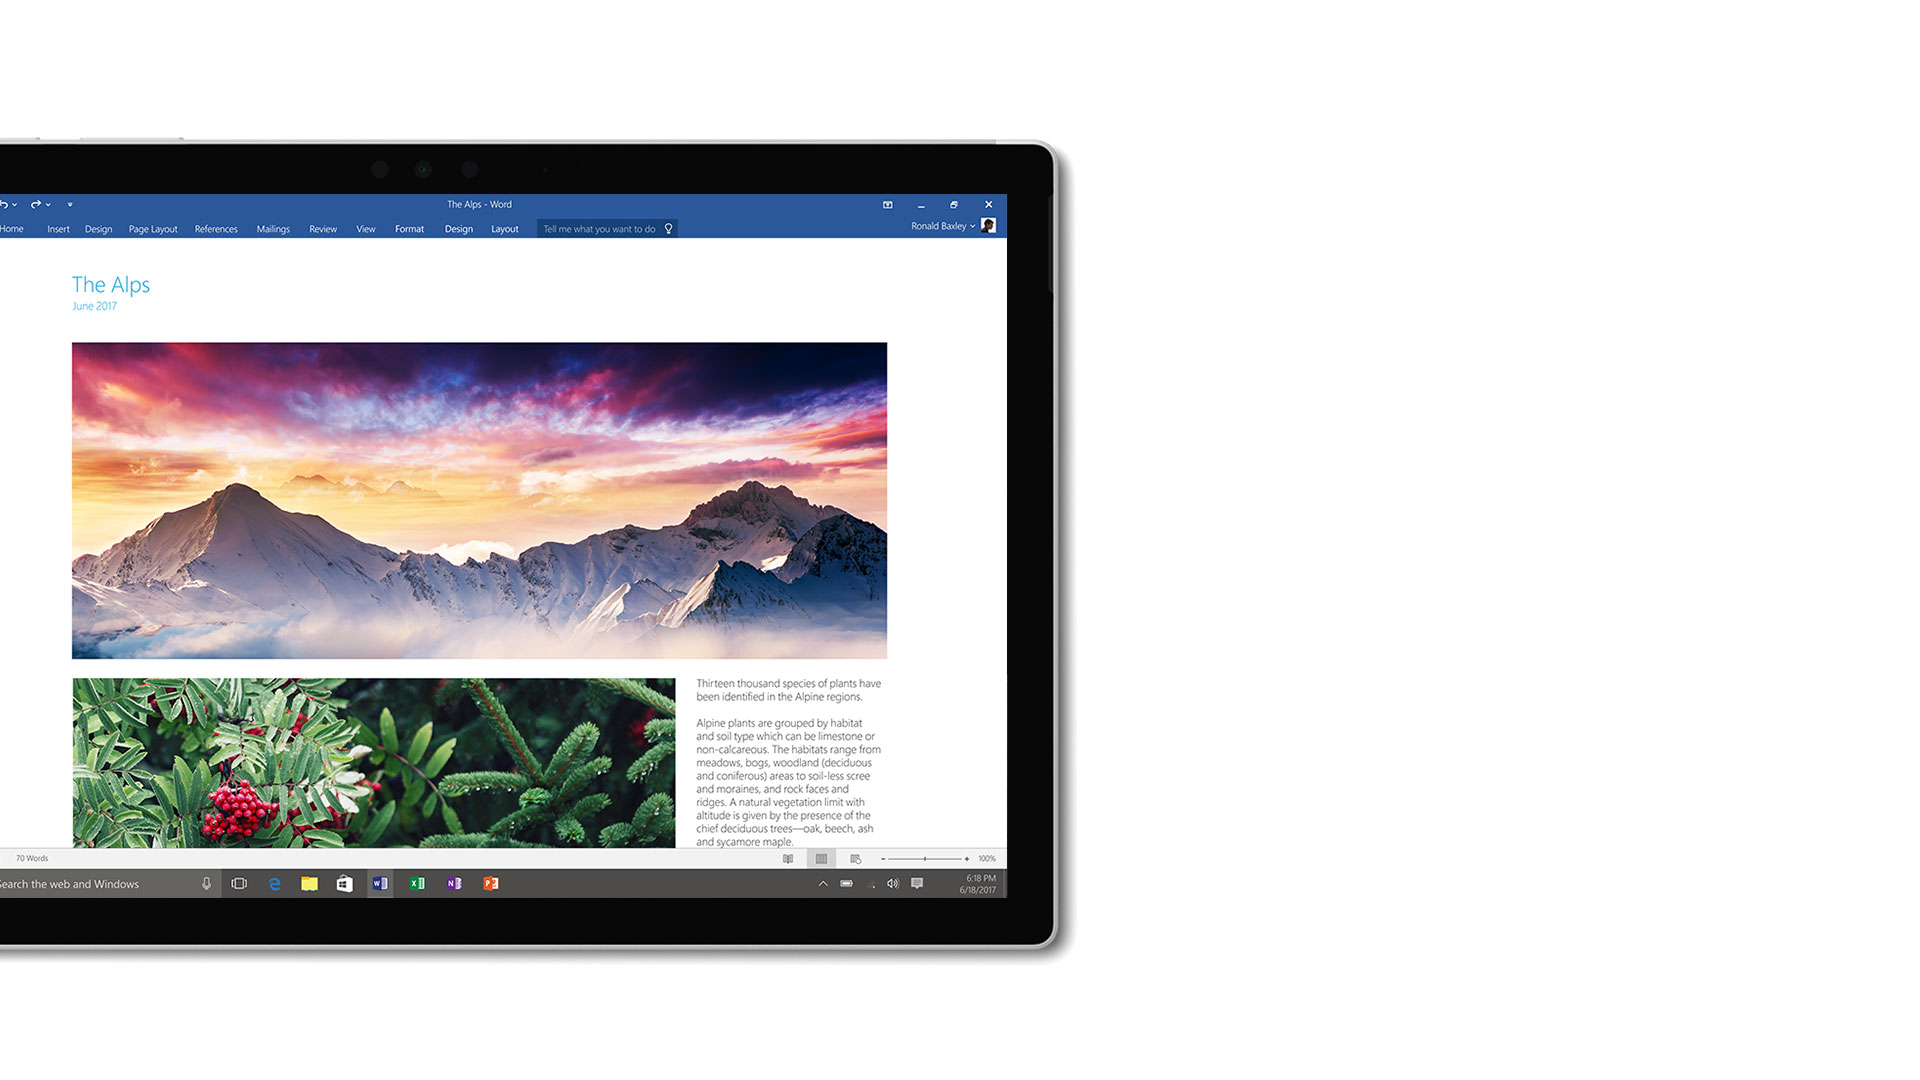 Image de l'interface utilisateur de Microsoft Word